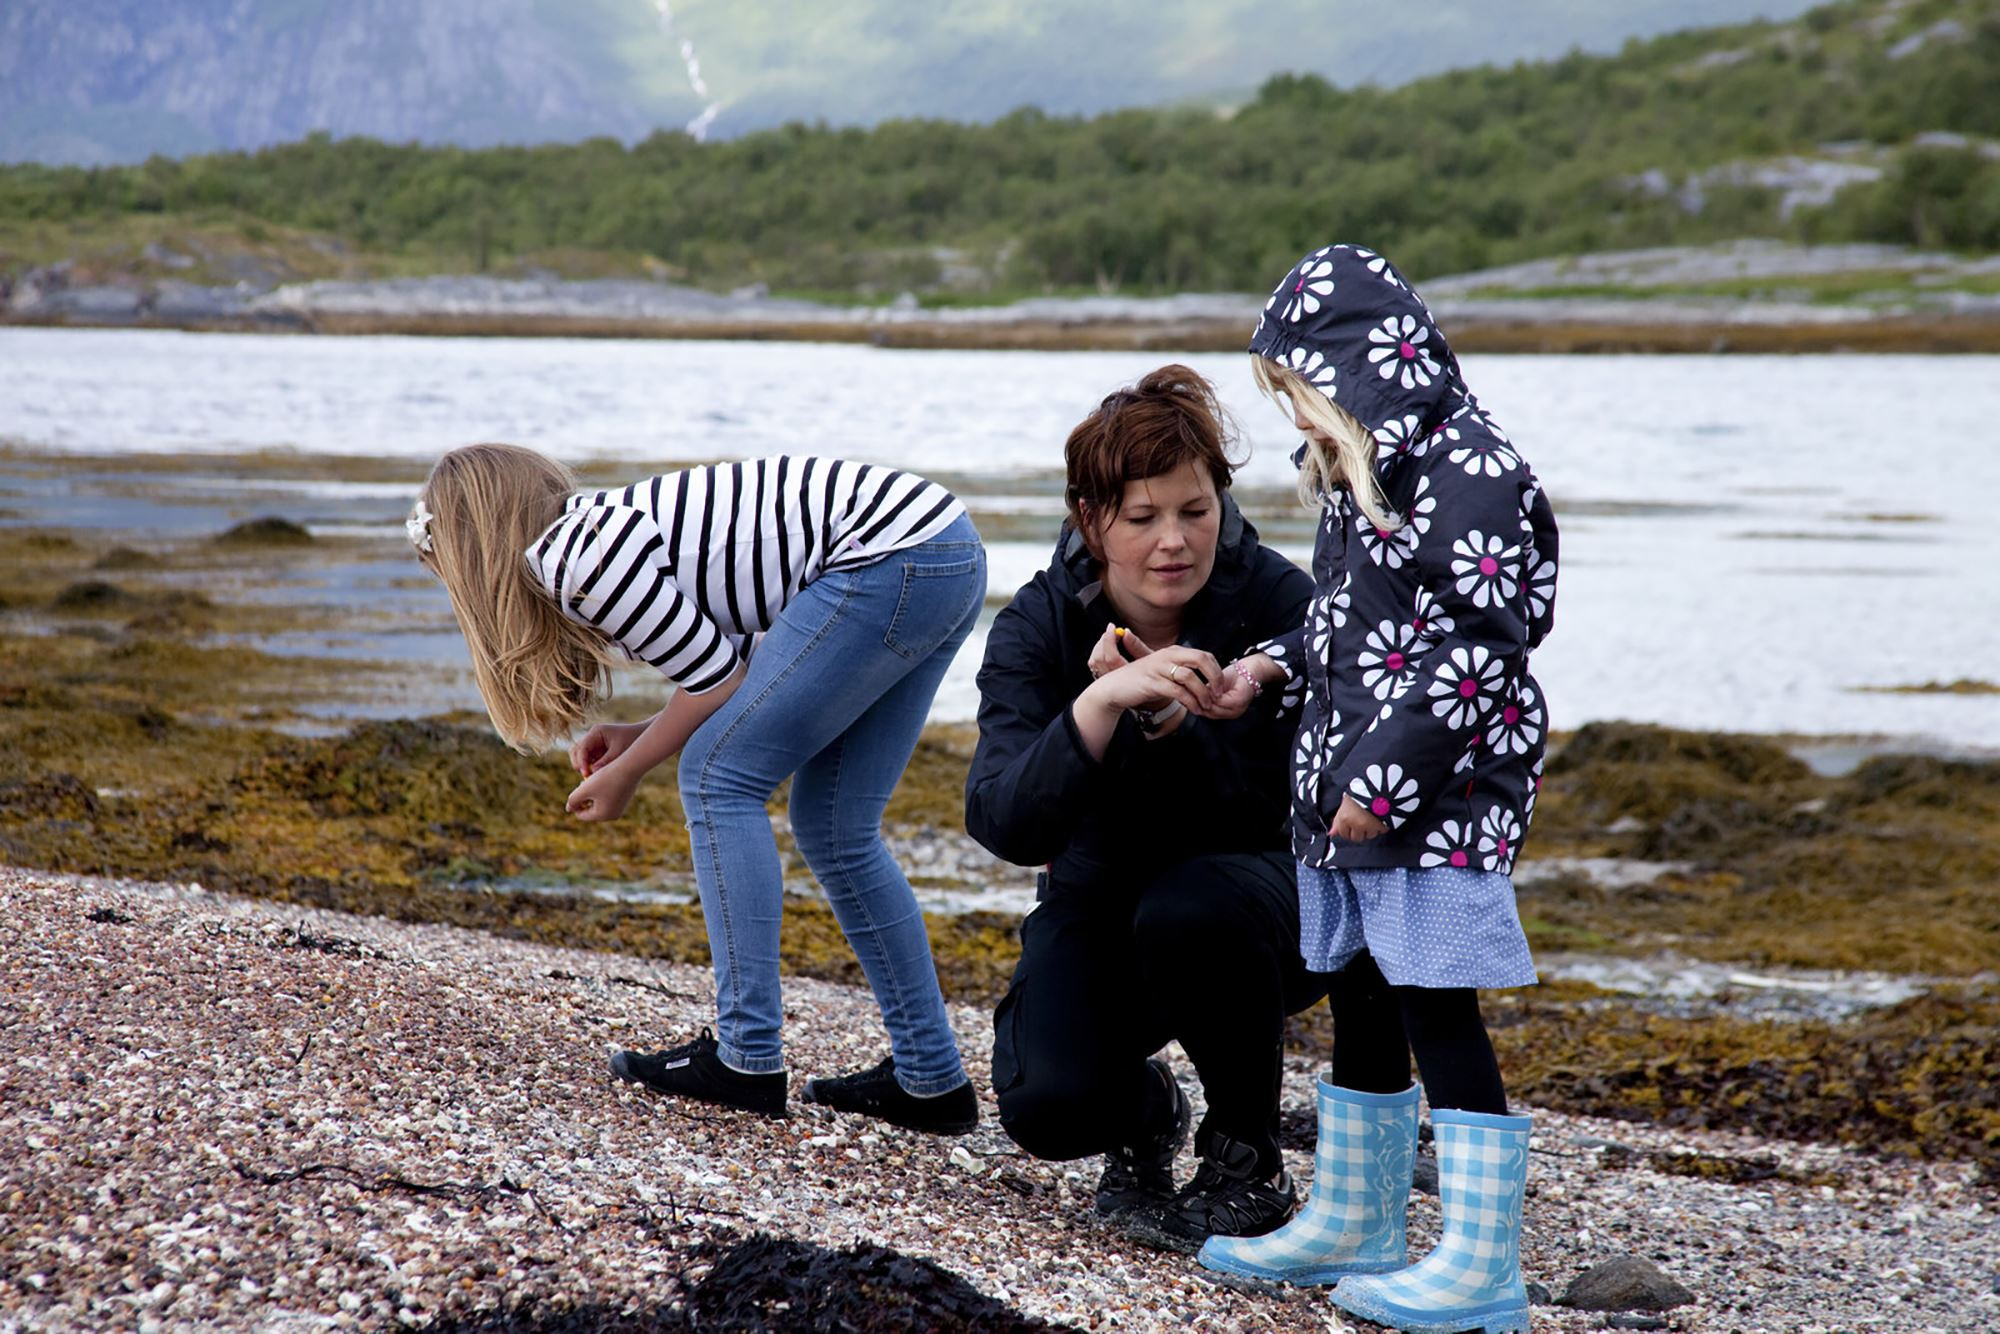 Øya Langholmen landskapsvernområde